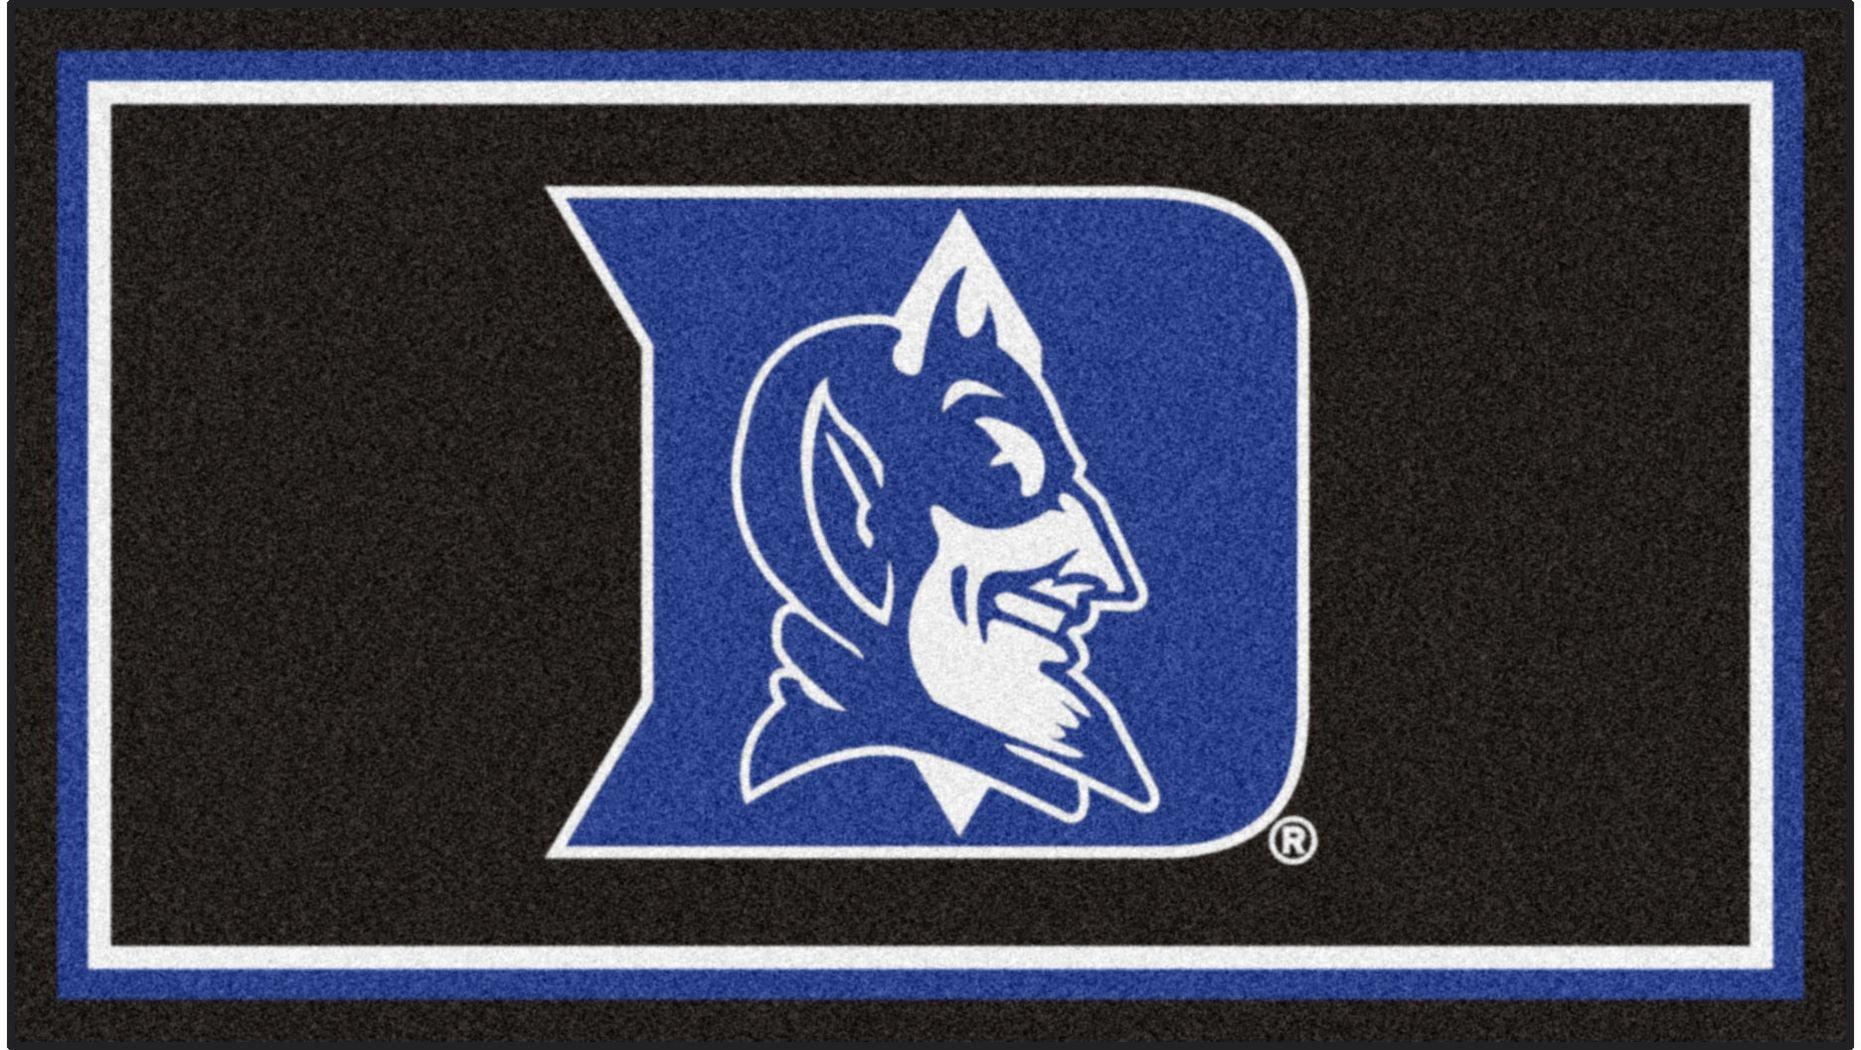 NCAA Big Game Duke University 3' x 5' Rug